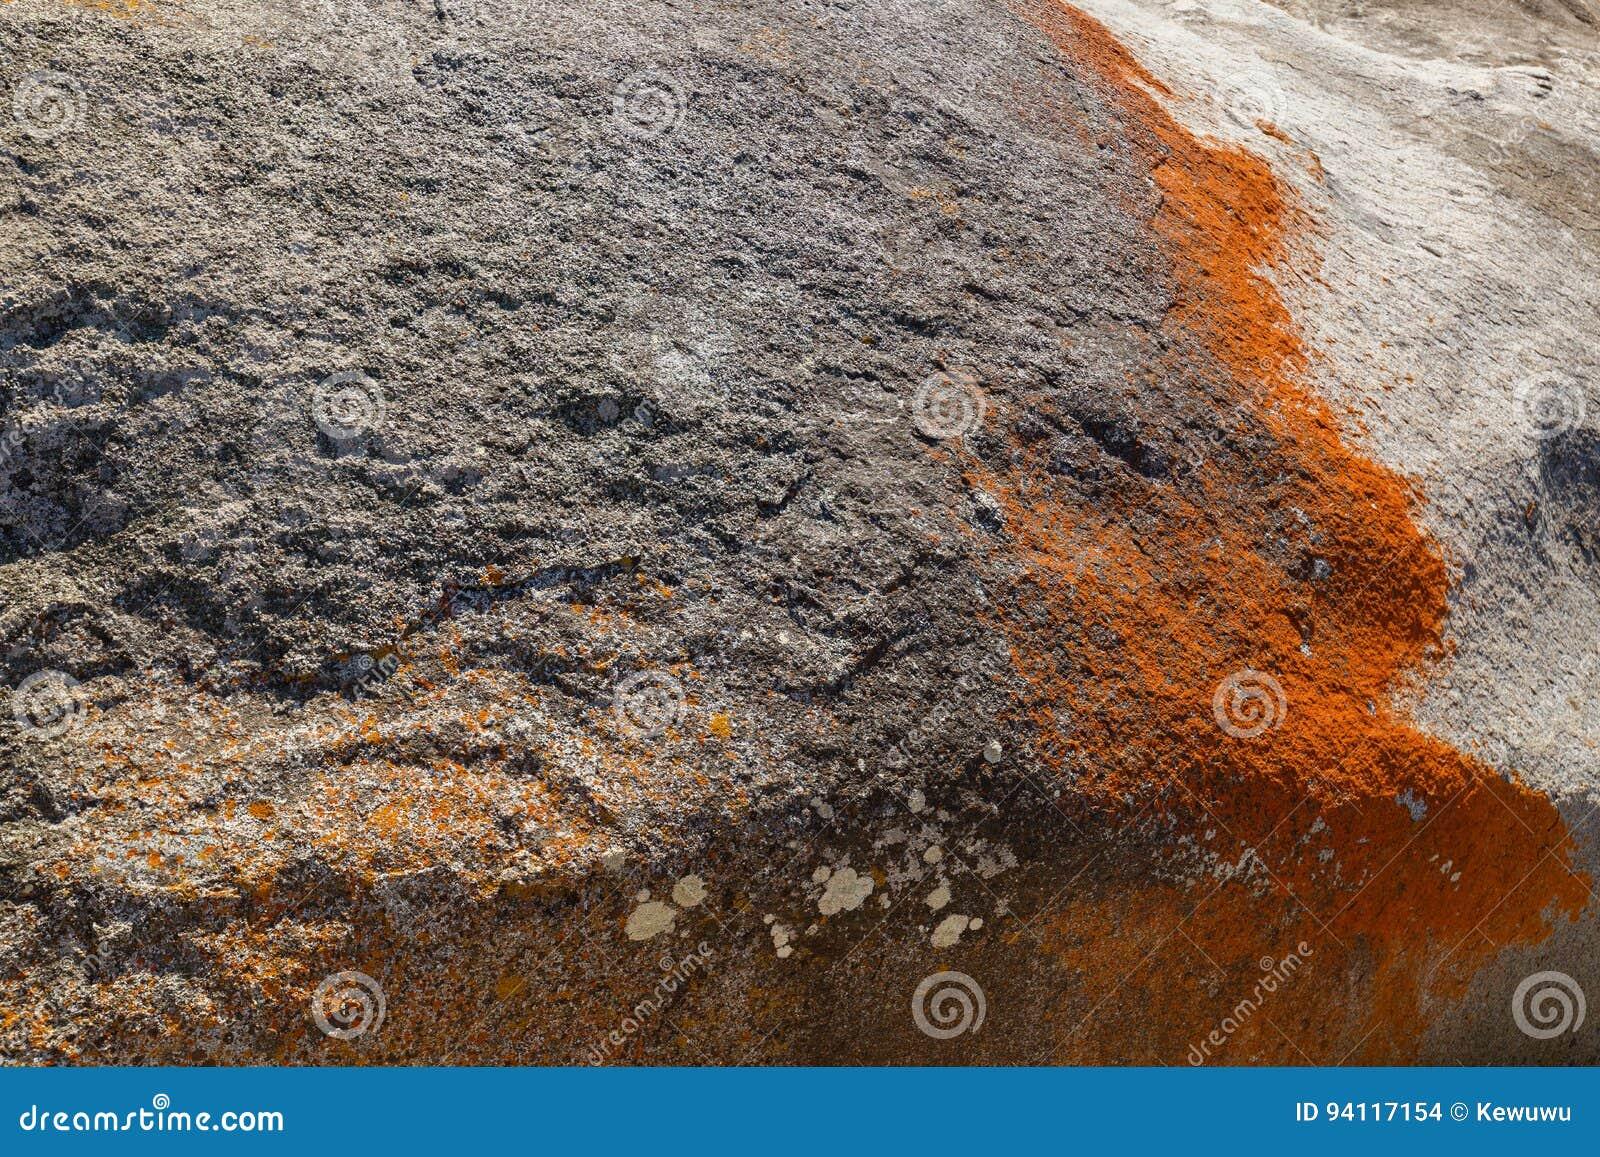 Closeup of red orange lichen growing on granite rocks formations